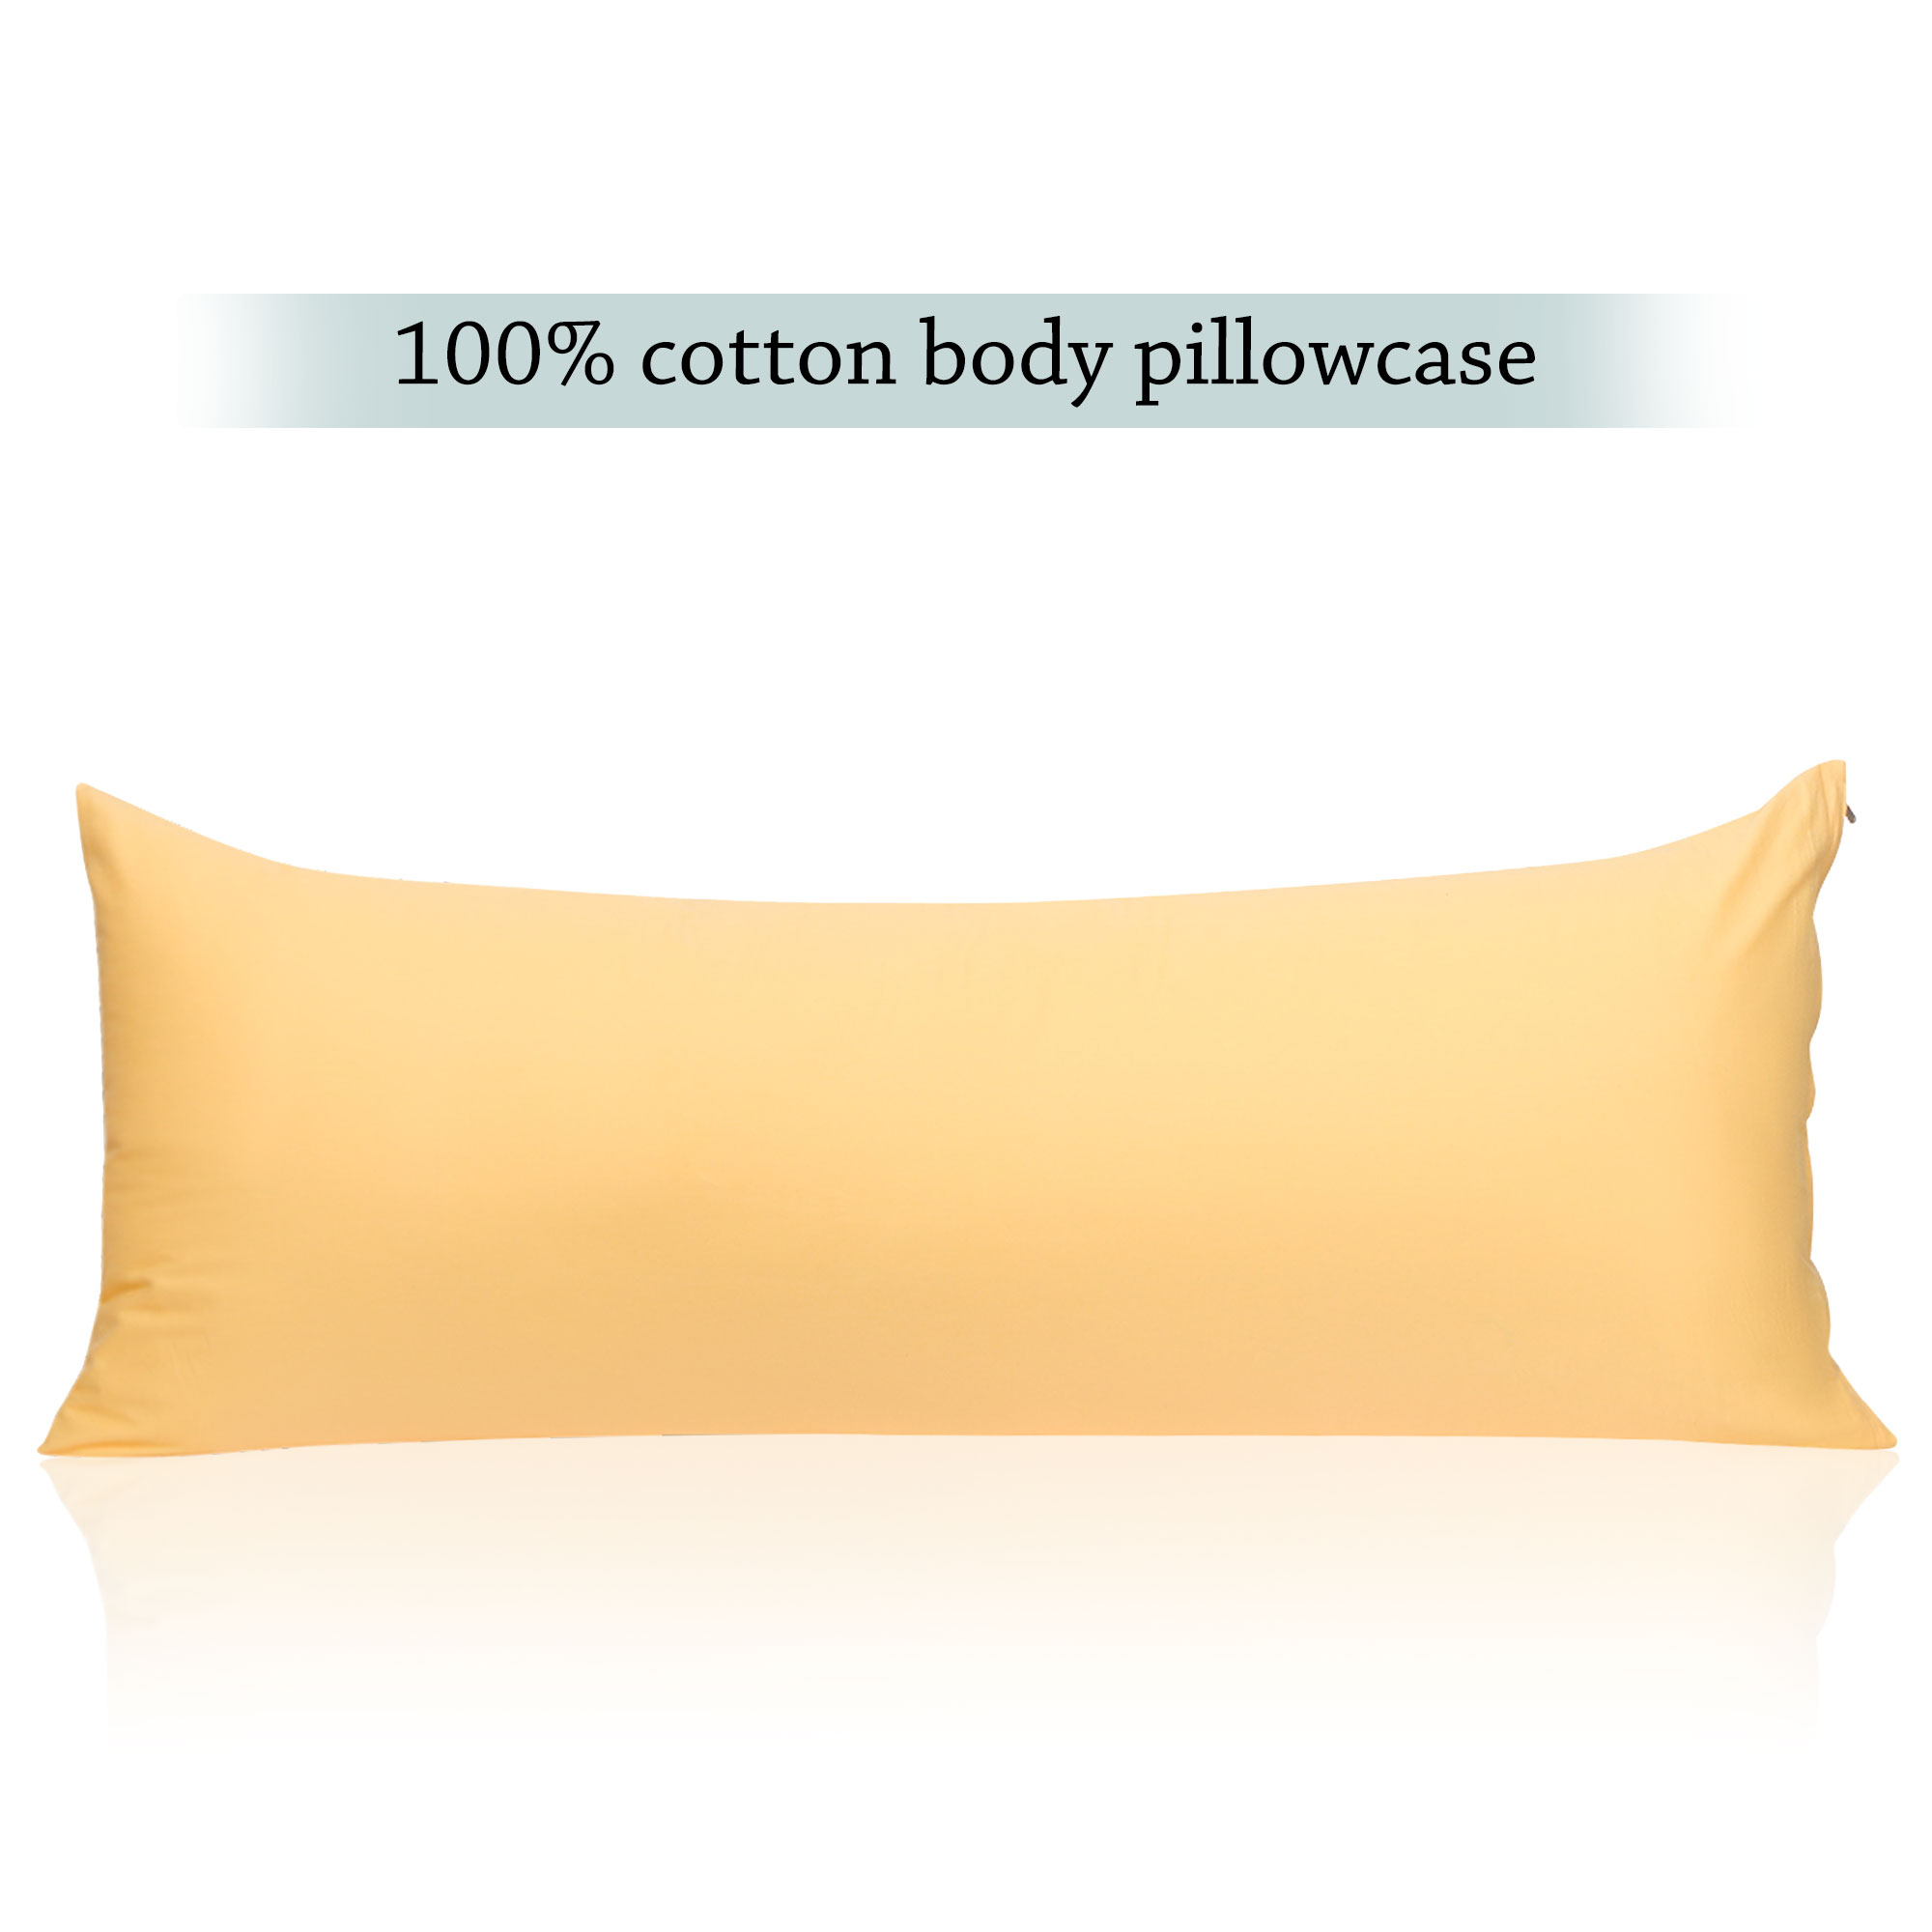 egyptian cotton body pillow case body pillow cover 1 each zippered pillowcase white 20 x 48 w l